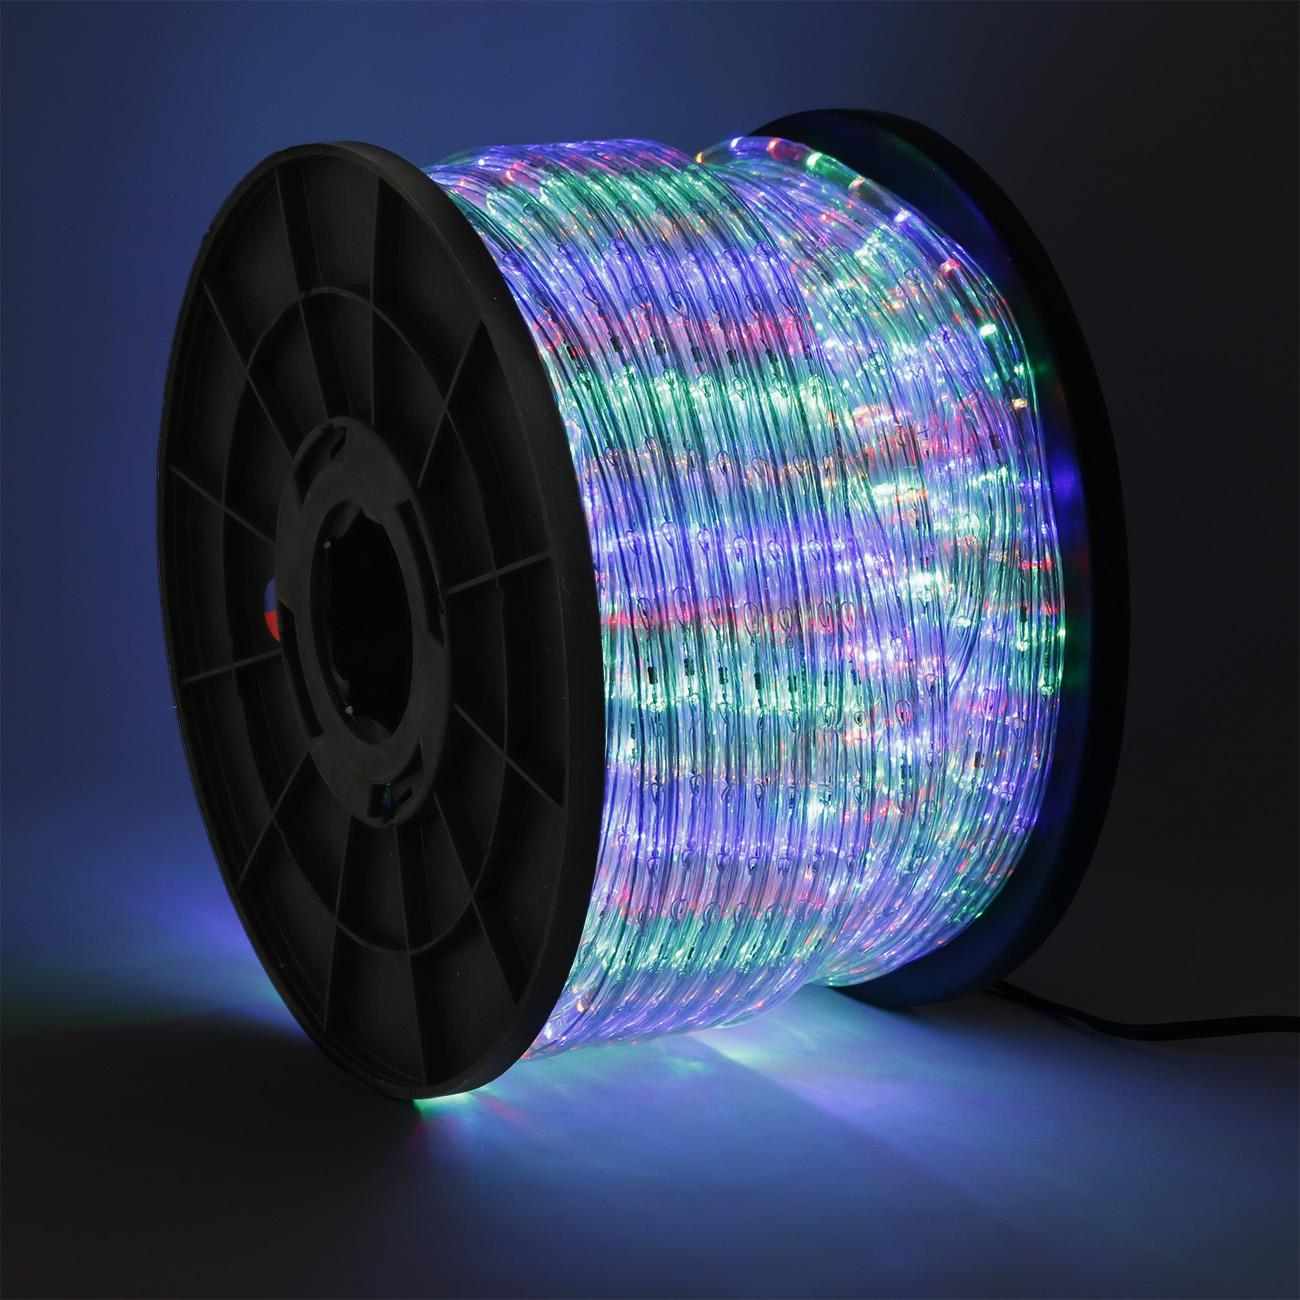 50 100 150 300ft led rope light 110v home party christmas decorative 50 100 150 300ft led rope light 110v aloadofball Image collections